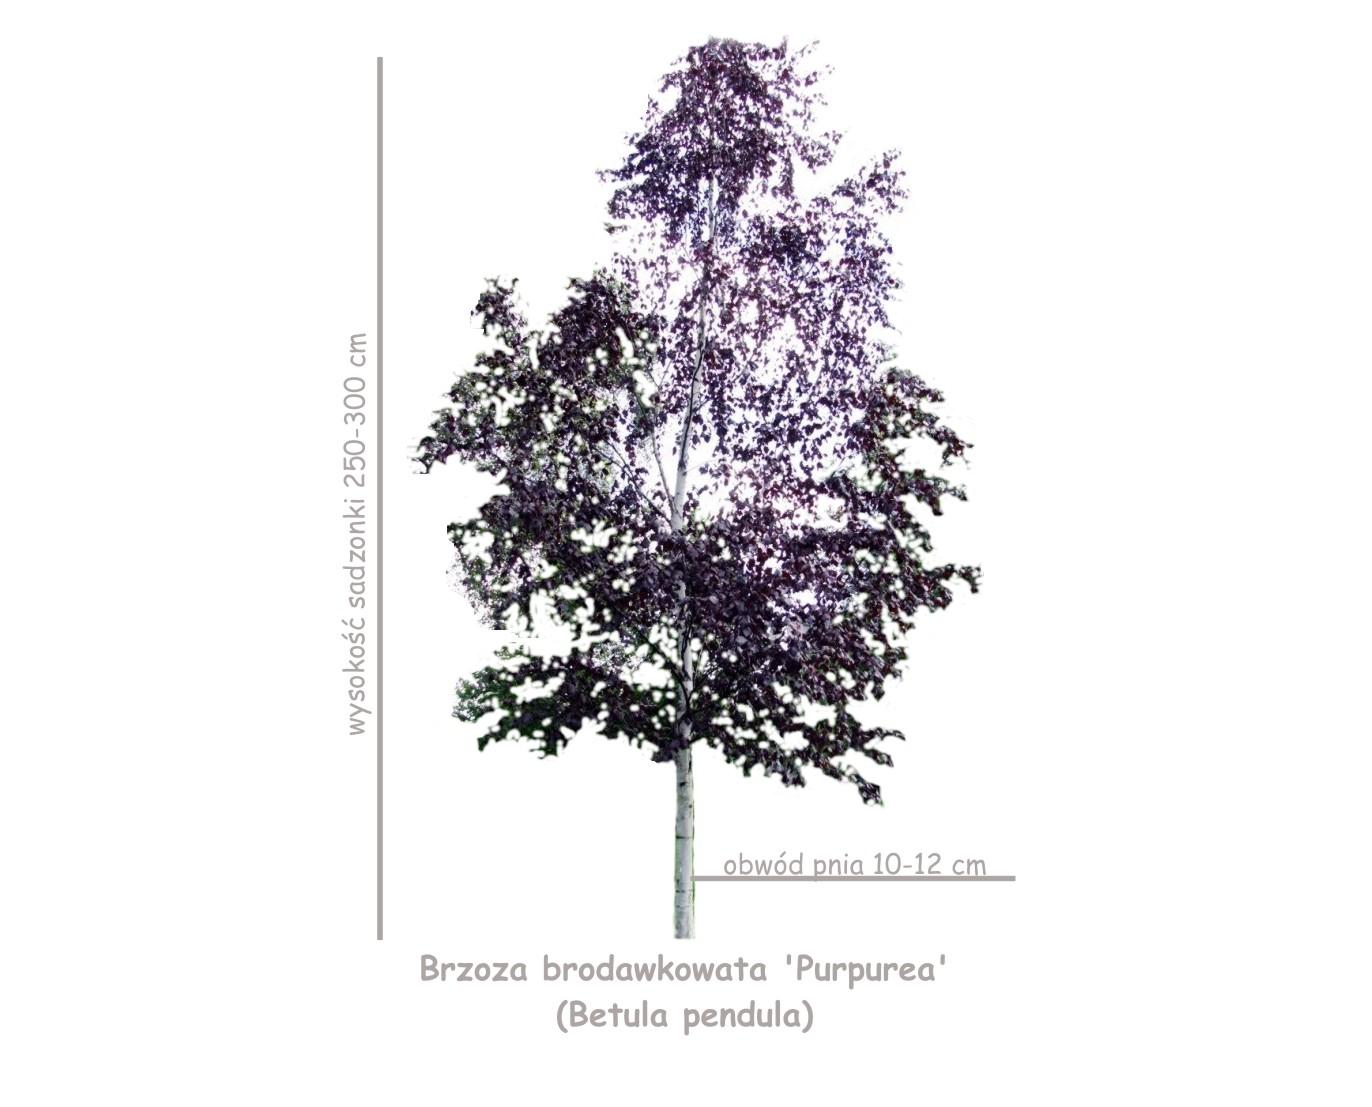 Brzoza brodawkowata 'Purpurea' (betula pendula) obwód pnia 10-12 cm